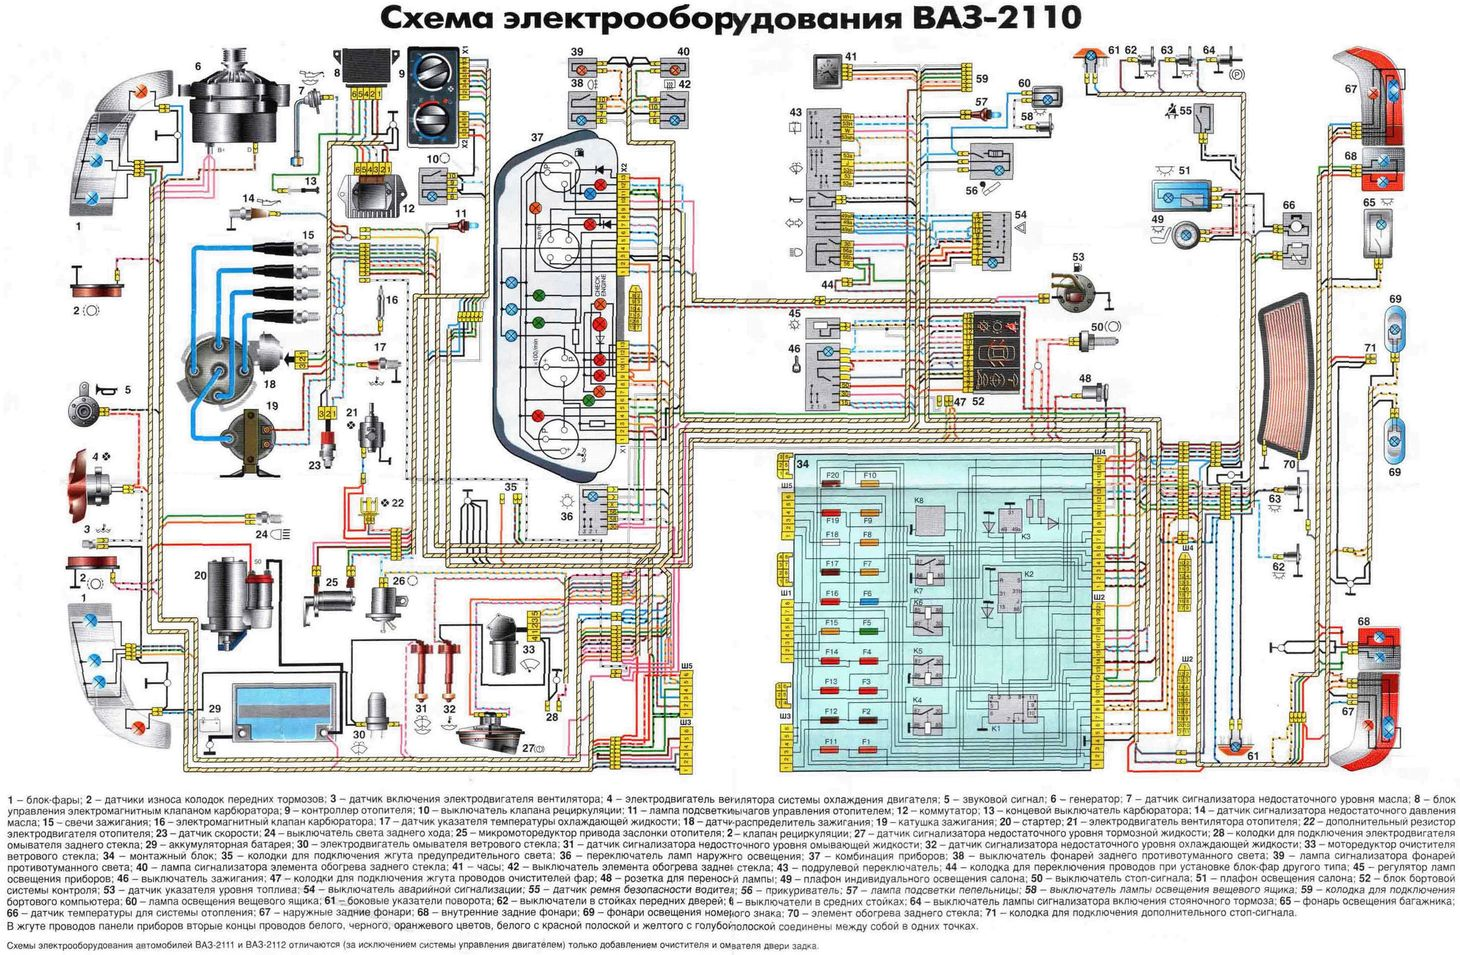 Фото №16 - ВАЗ 2110 инжектор схема